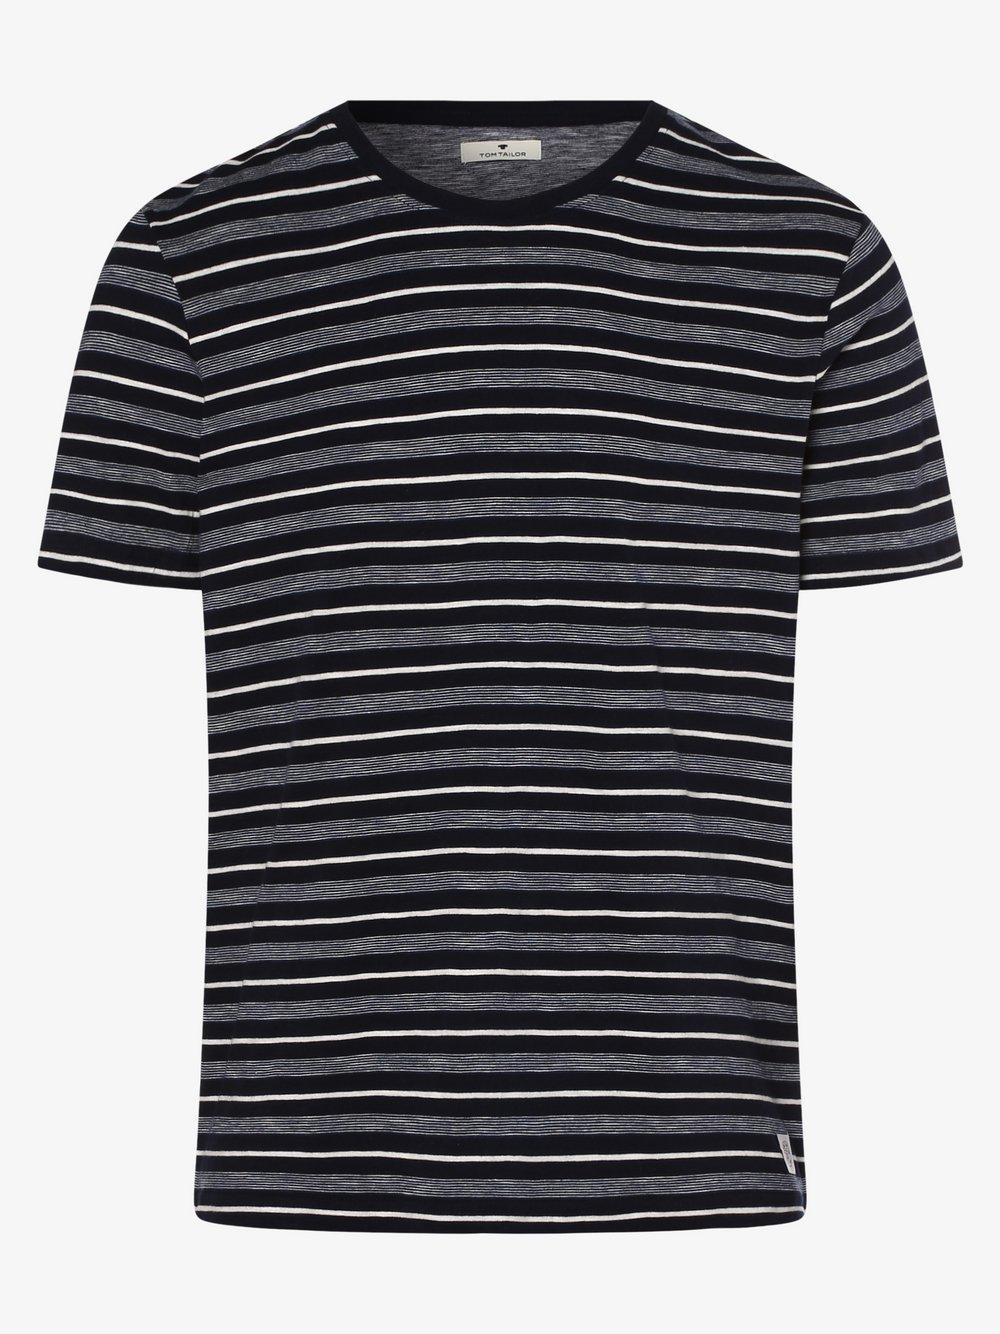 Tom Tailor – T-shirt męski, szary Van Graaf 487274-0002-09970